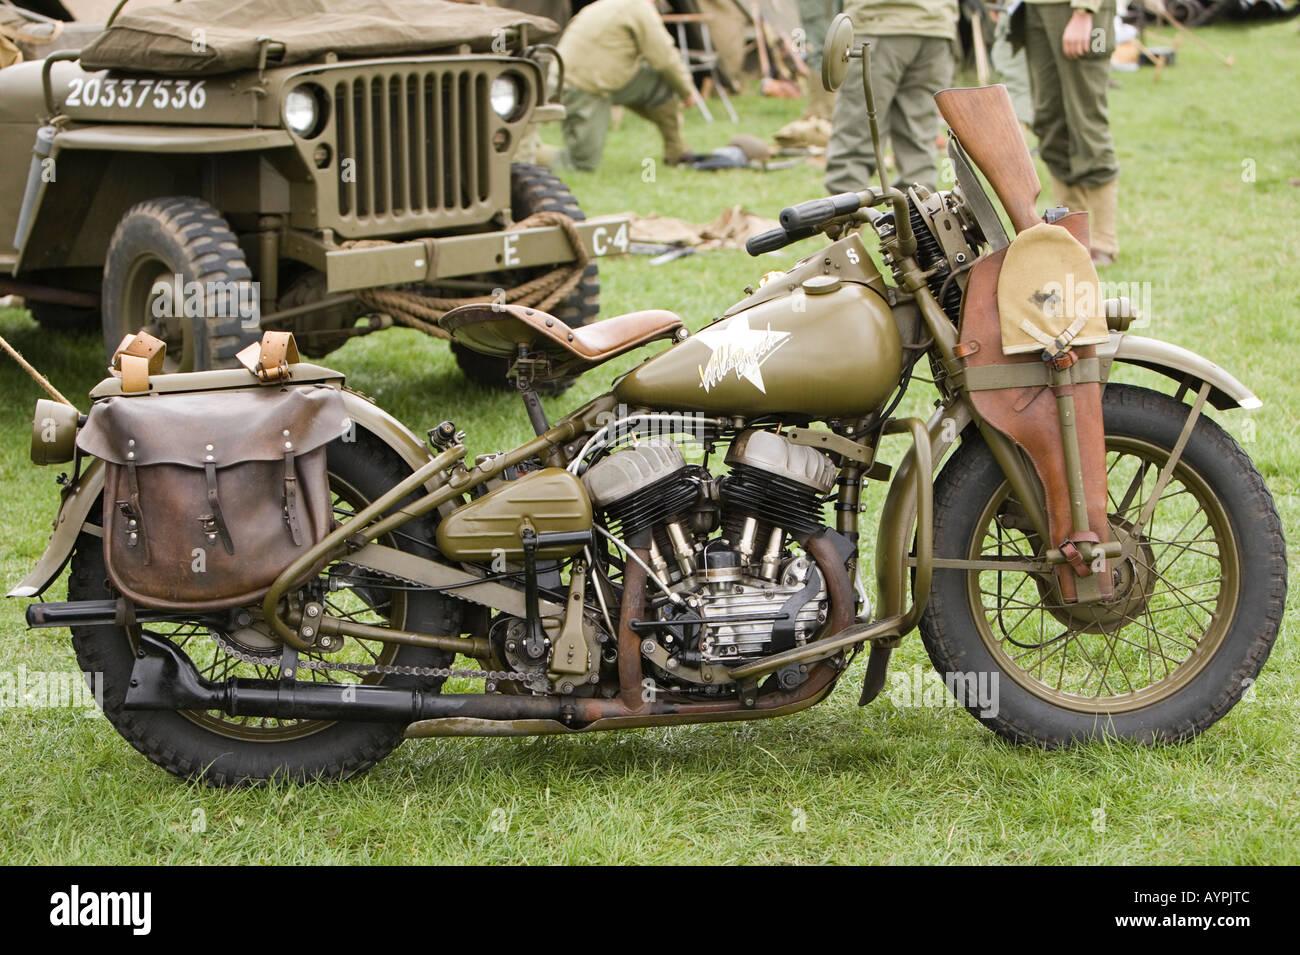 Harley Davidson Army: Harley Davidson Motorcycle US Army WLA Stock Photo